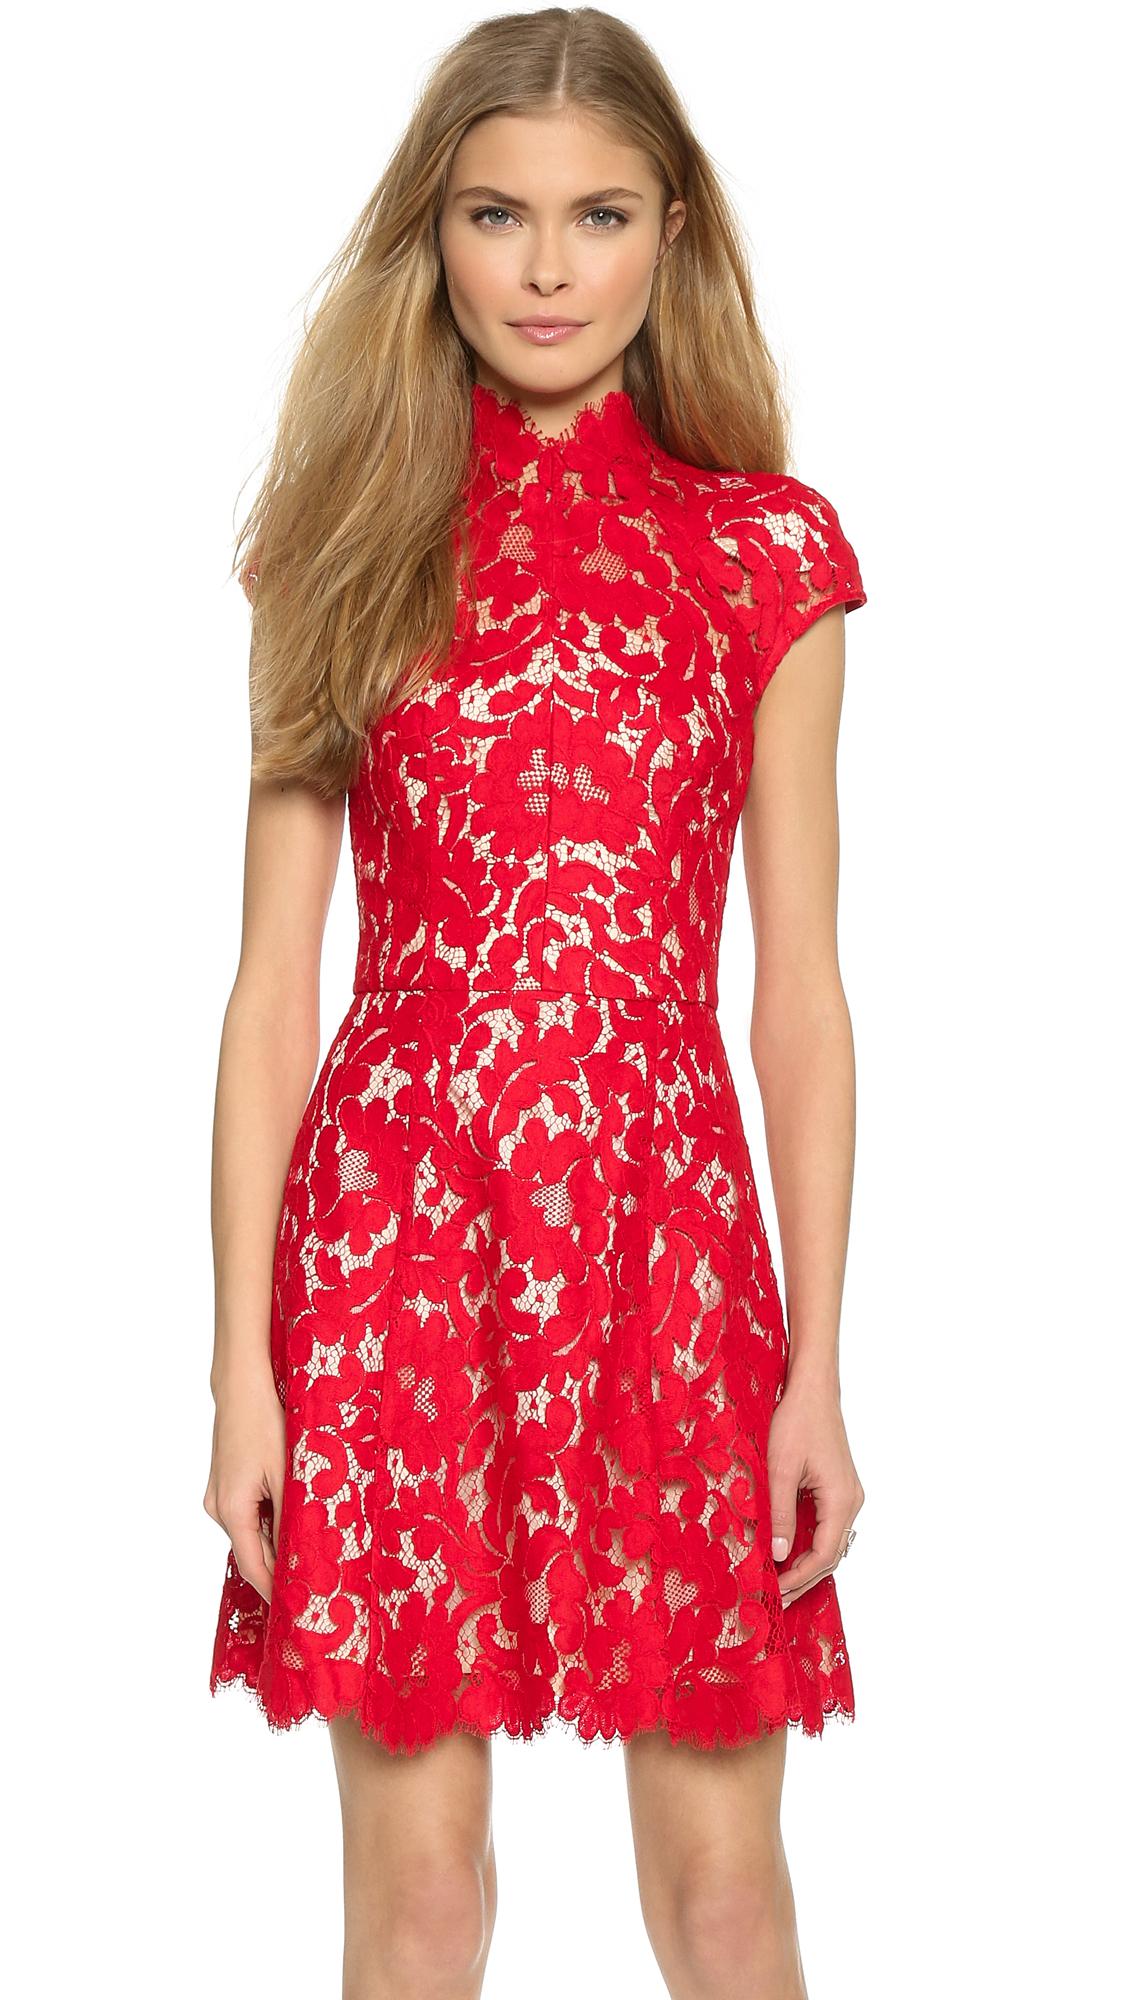 Lover Warrior Lace Mini Dress - Rose